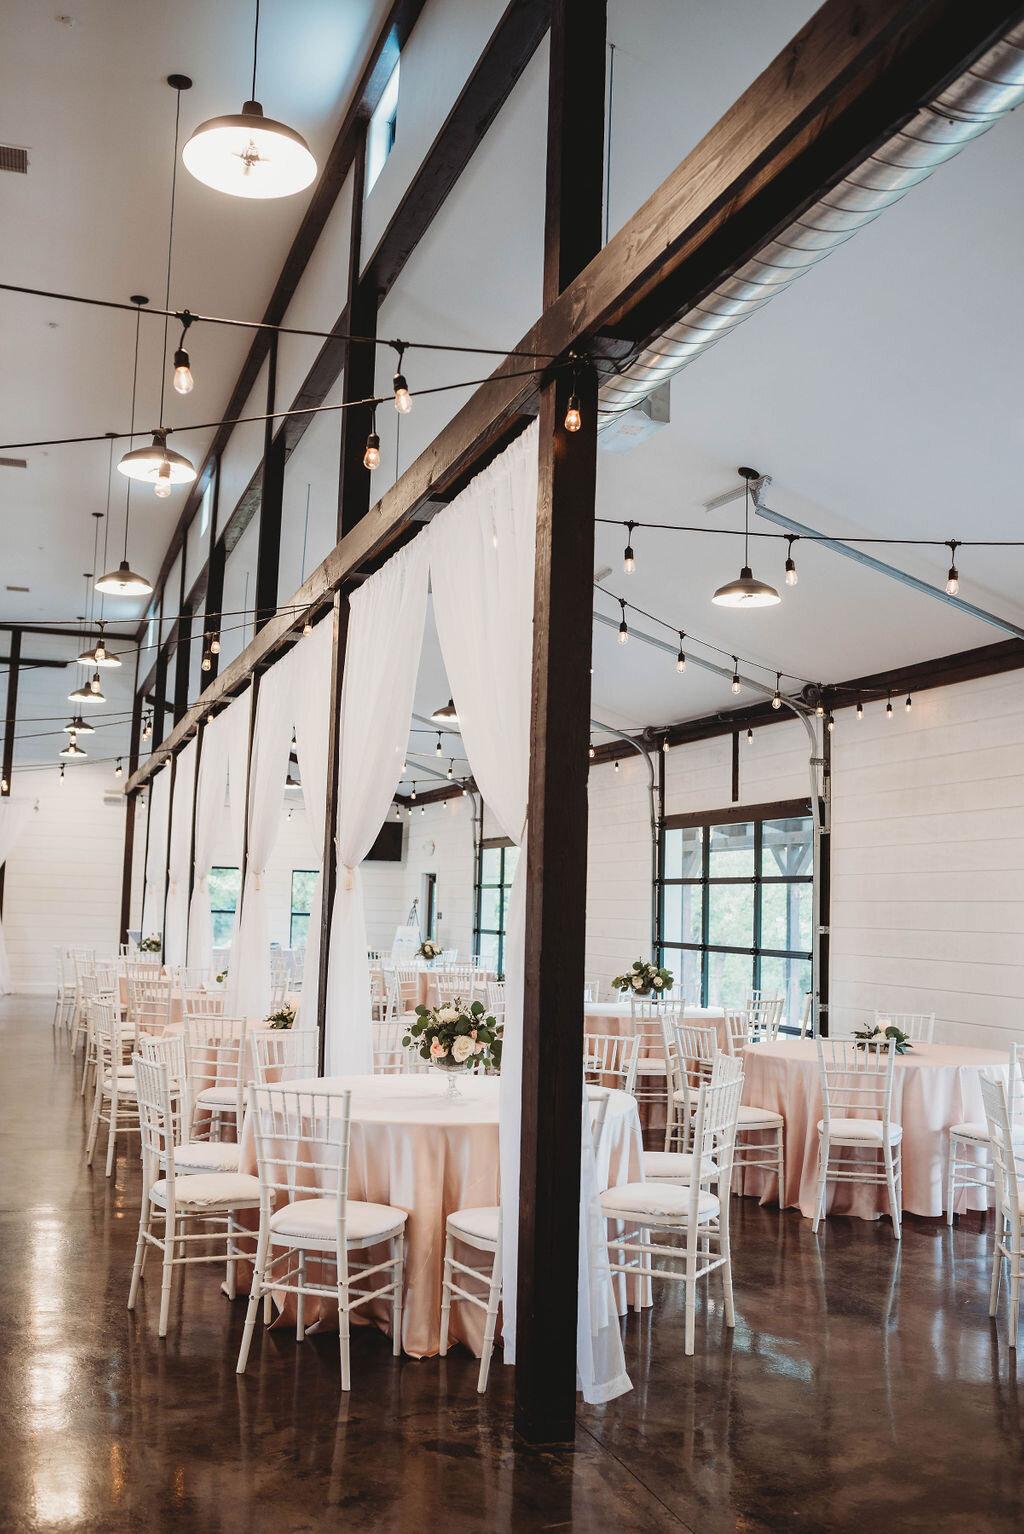 Tulsa Wedding Venue with a View 5.jpg